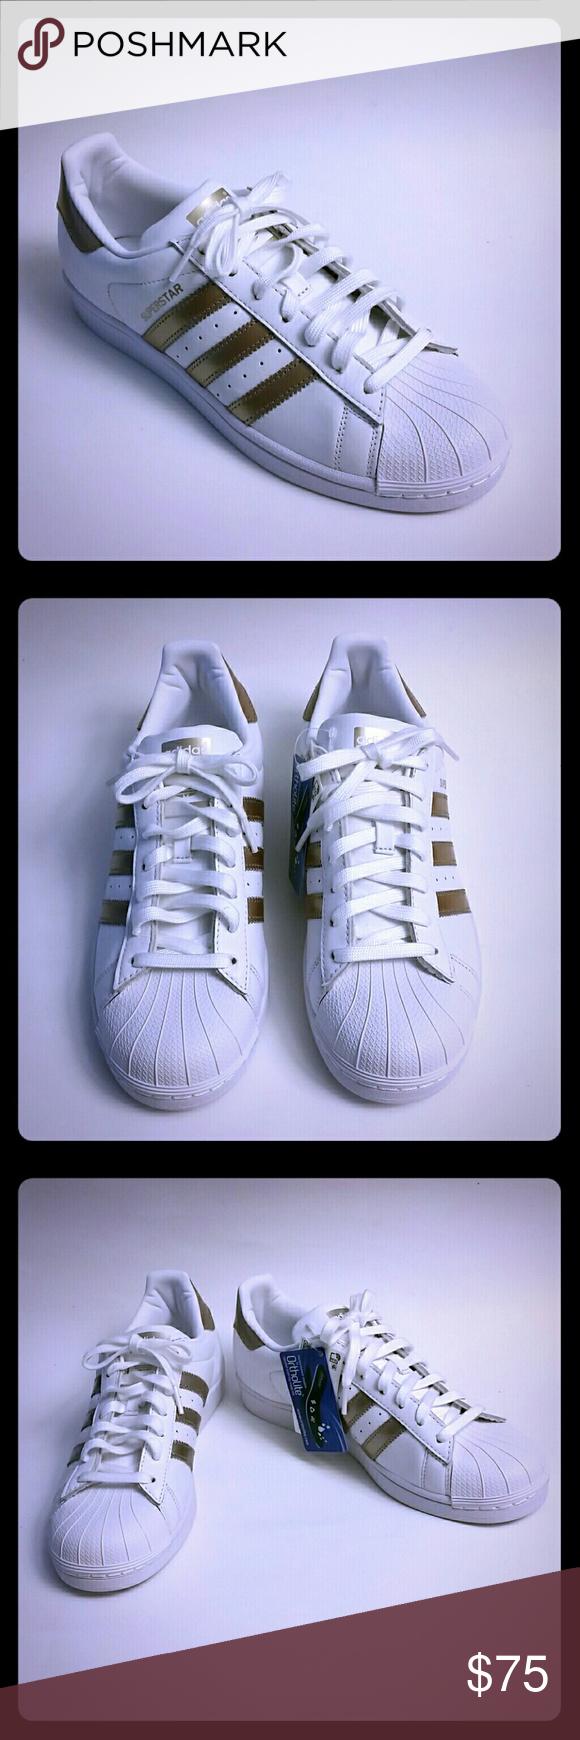 Adidas Superstar Sneakers-Ortholite